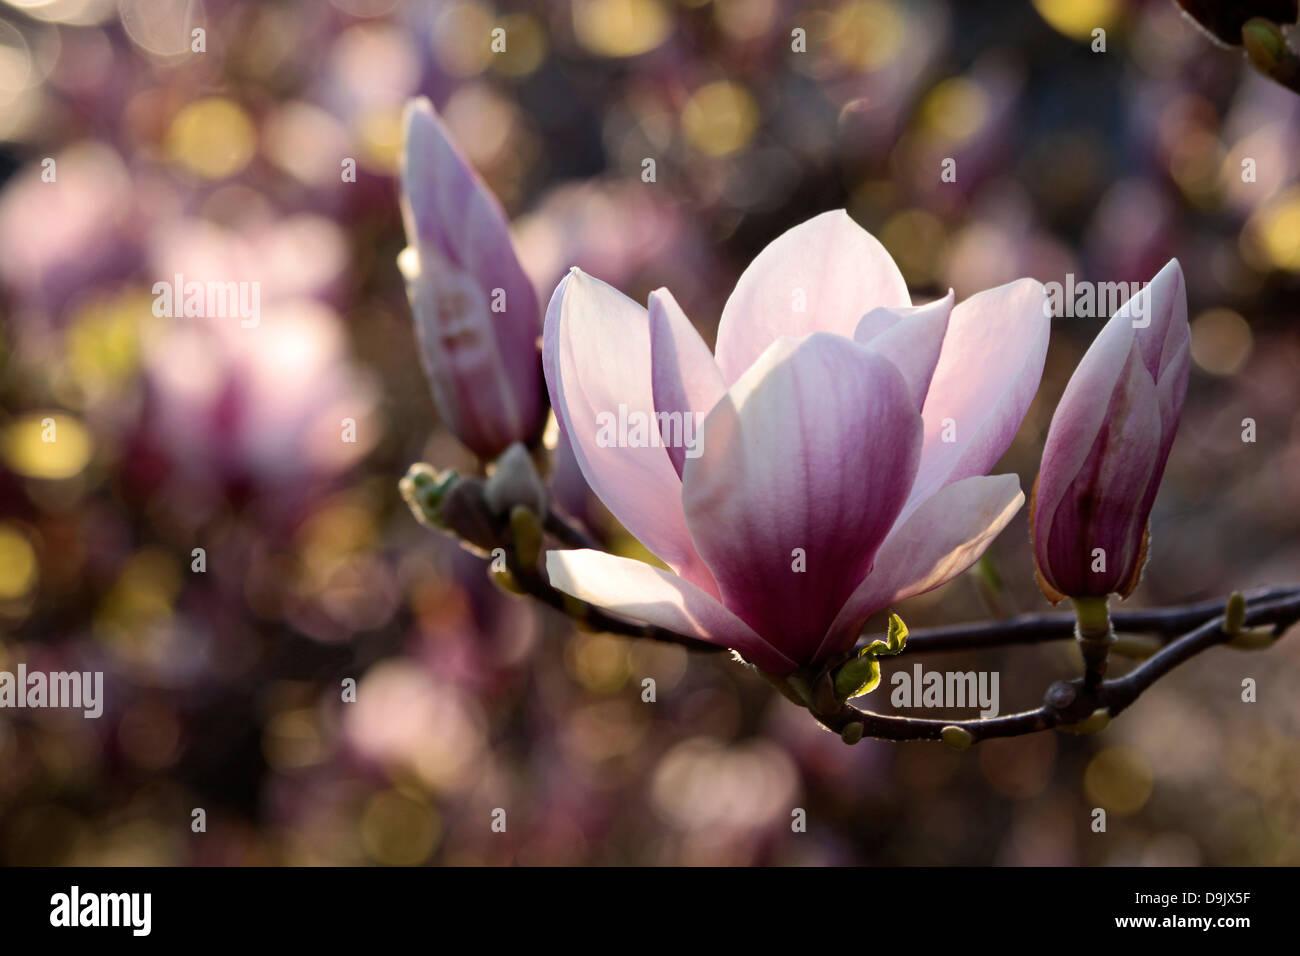 Blooms Wiesbaden